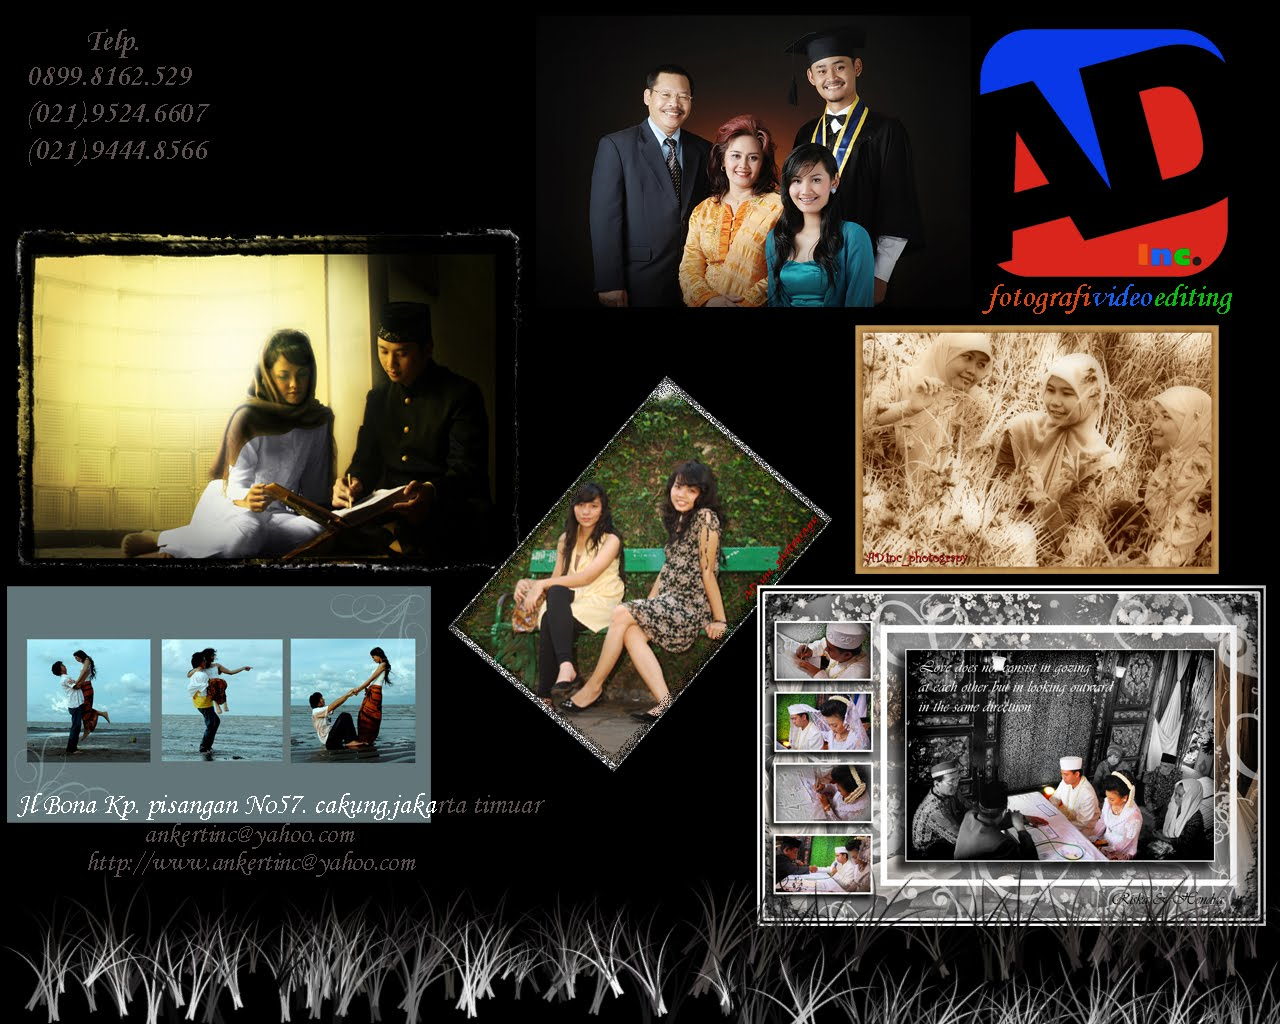 daftar harga jasa foto video editing foto wedding foto wedding rp 2